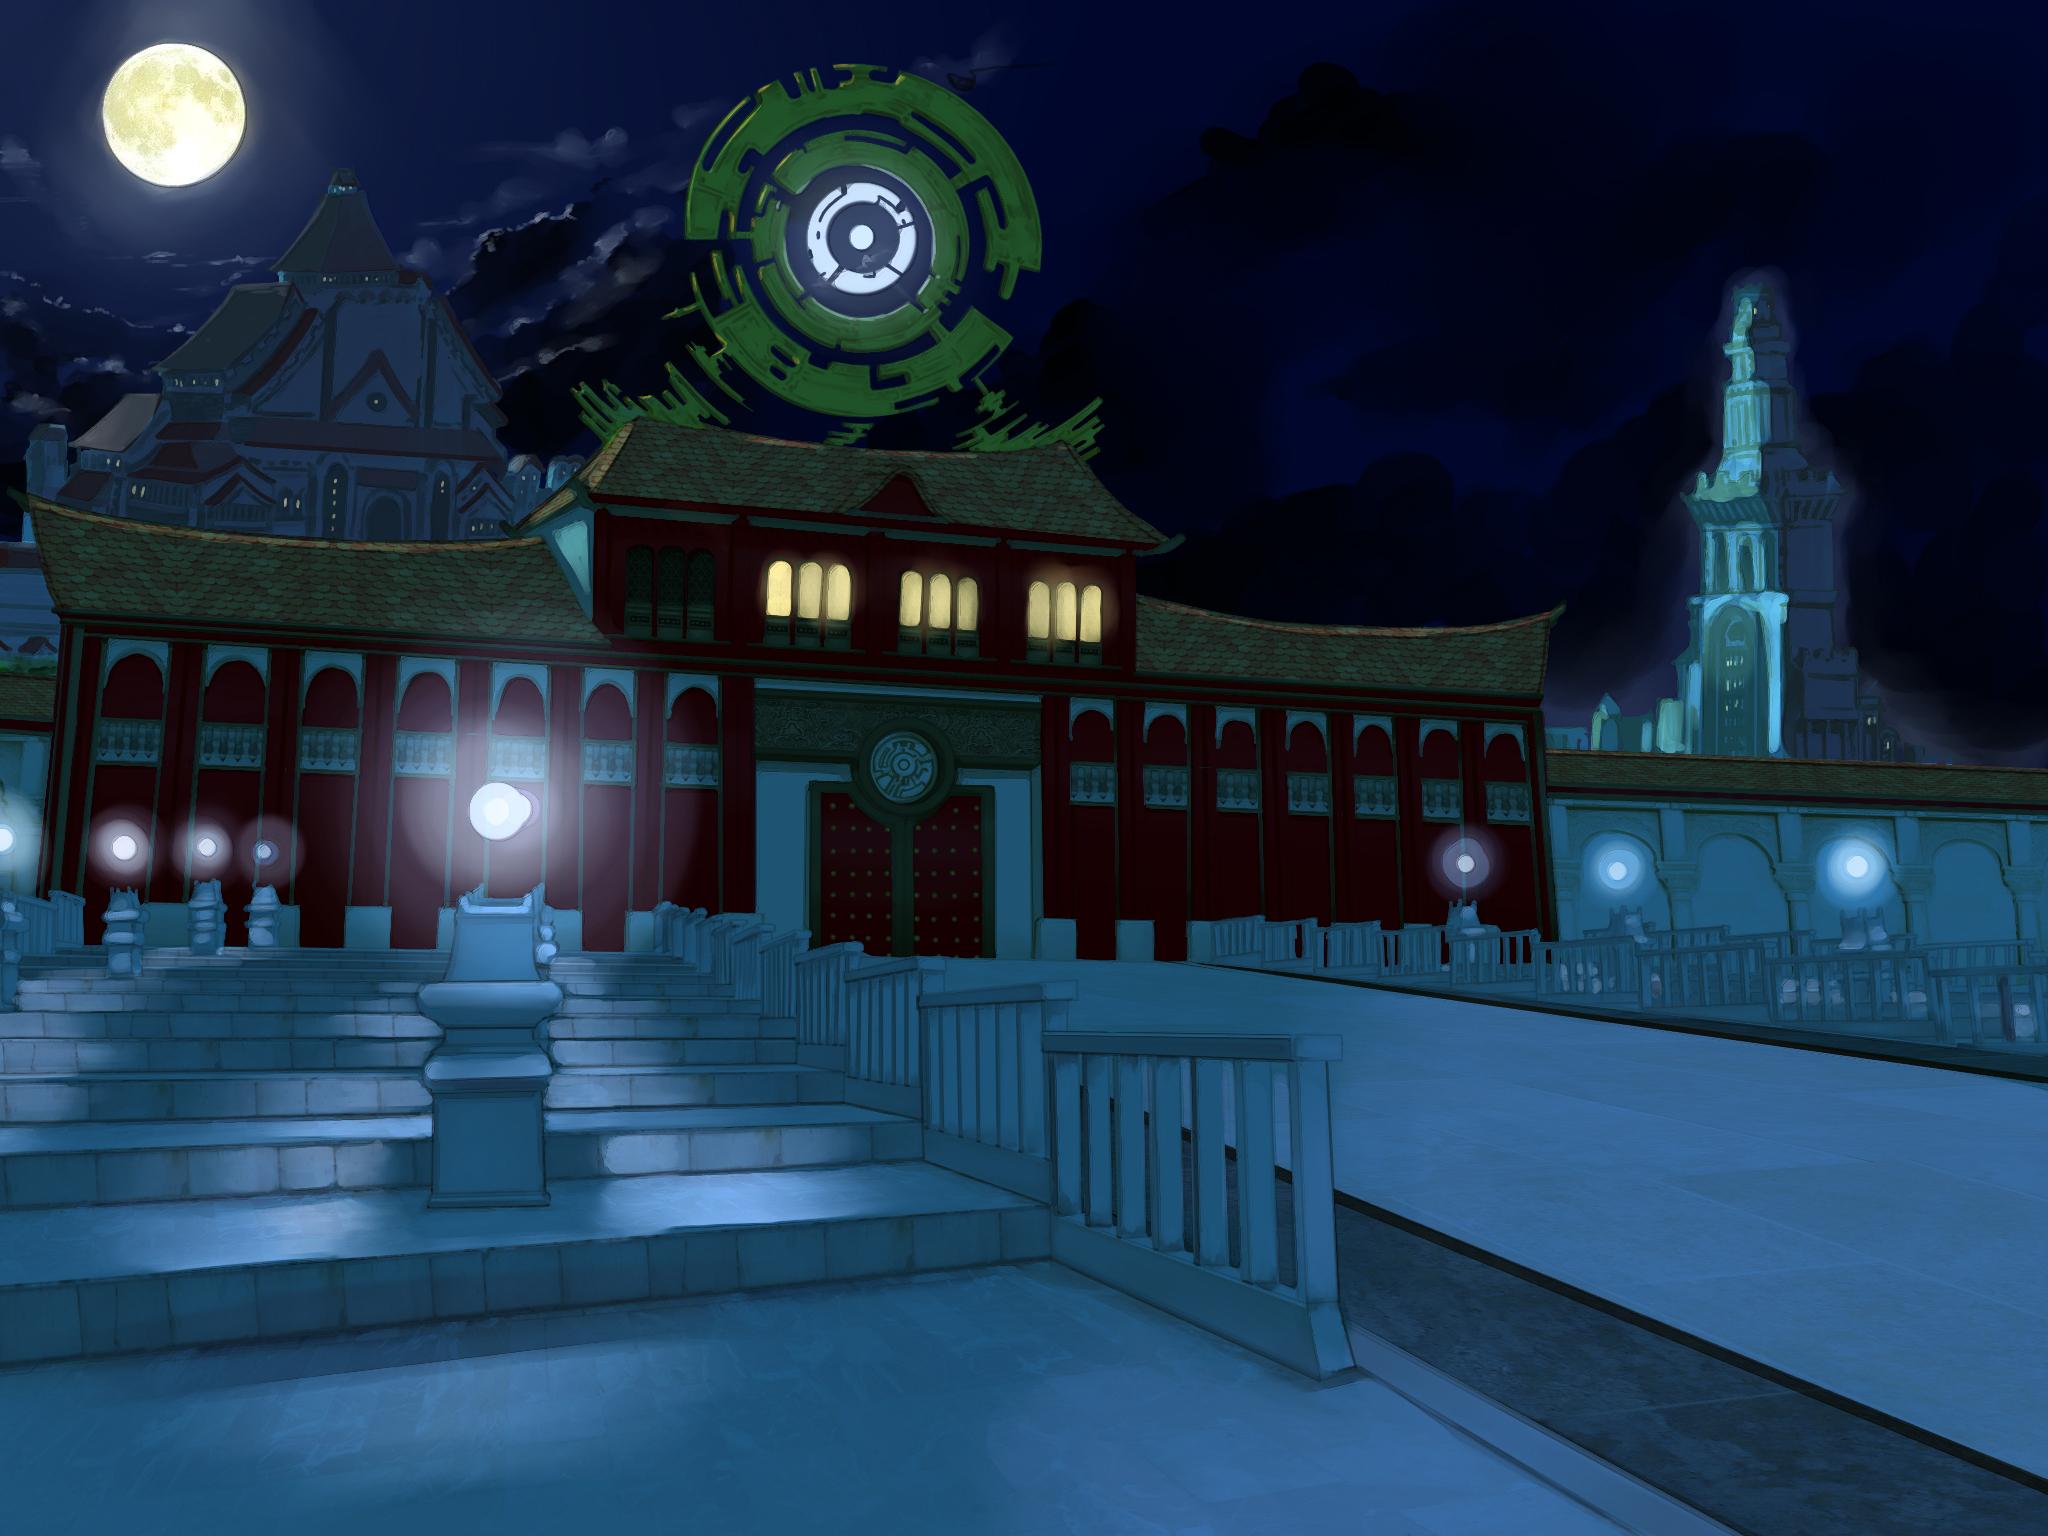 Palace wall_night.jpg